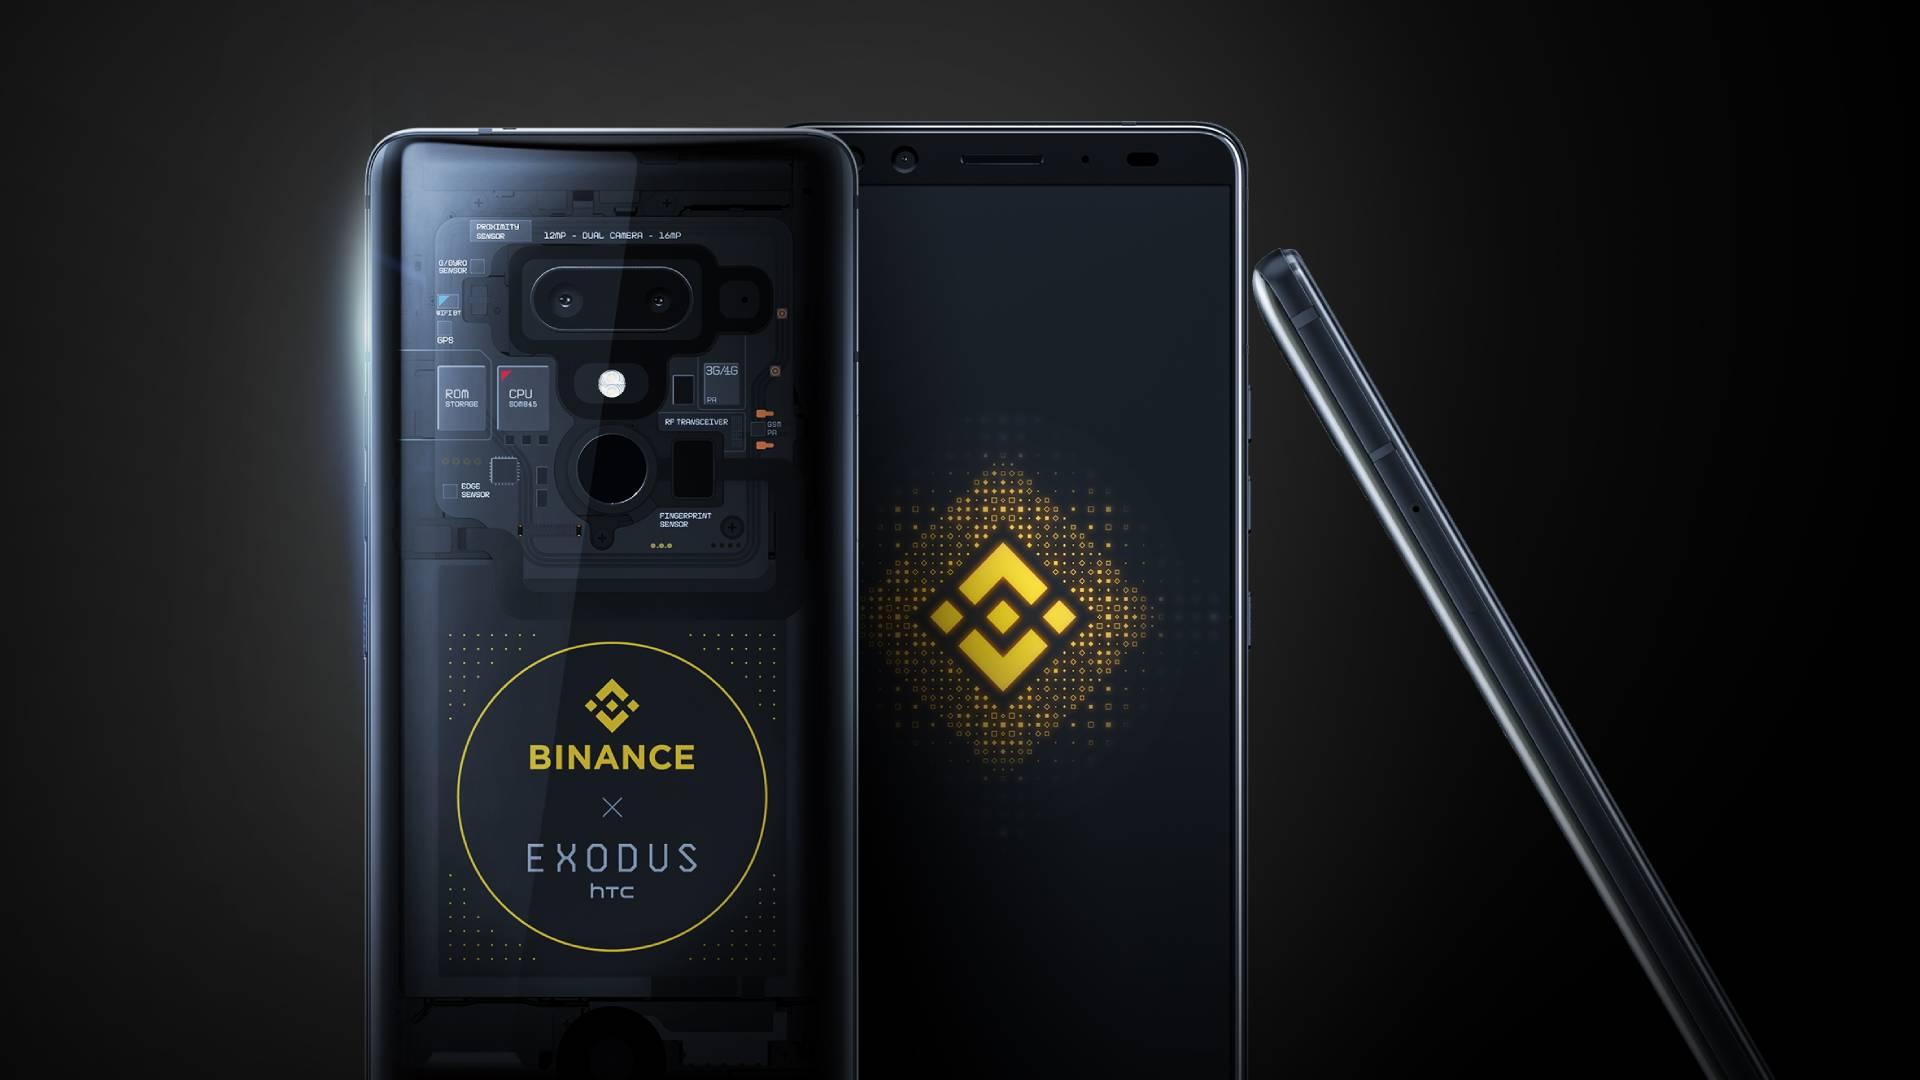 HTC Exodus 1 cryptophone gets Binance Edition upgrade   Decrypt 1920x1080